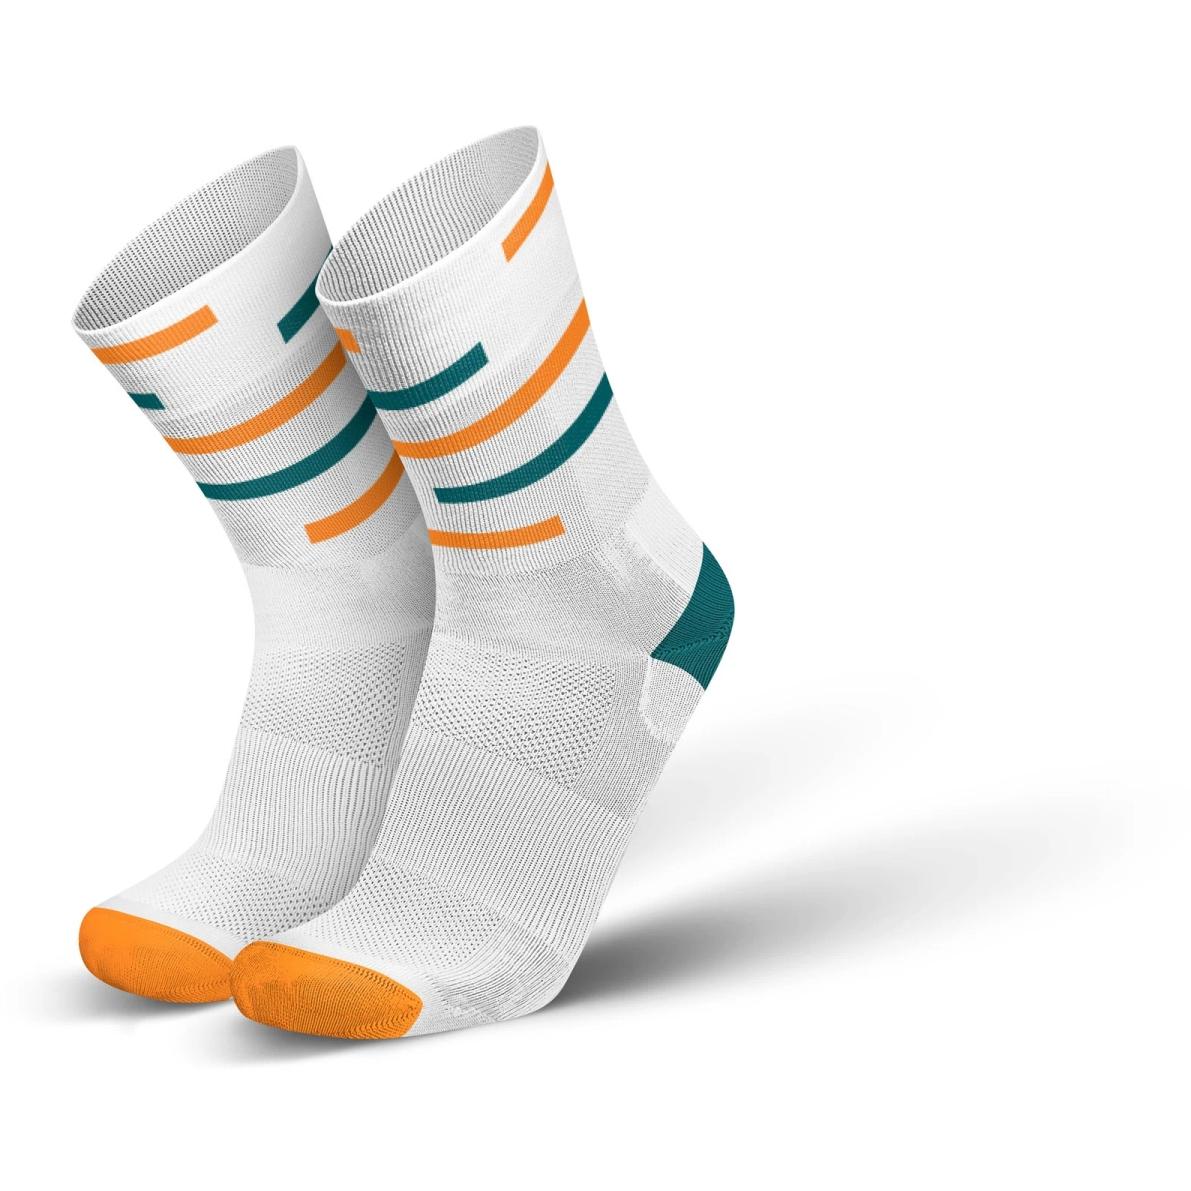 Produktbild von INCYLENCE Ultralight Motions Socken - Petrol Orange